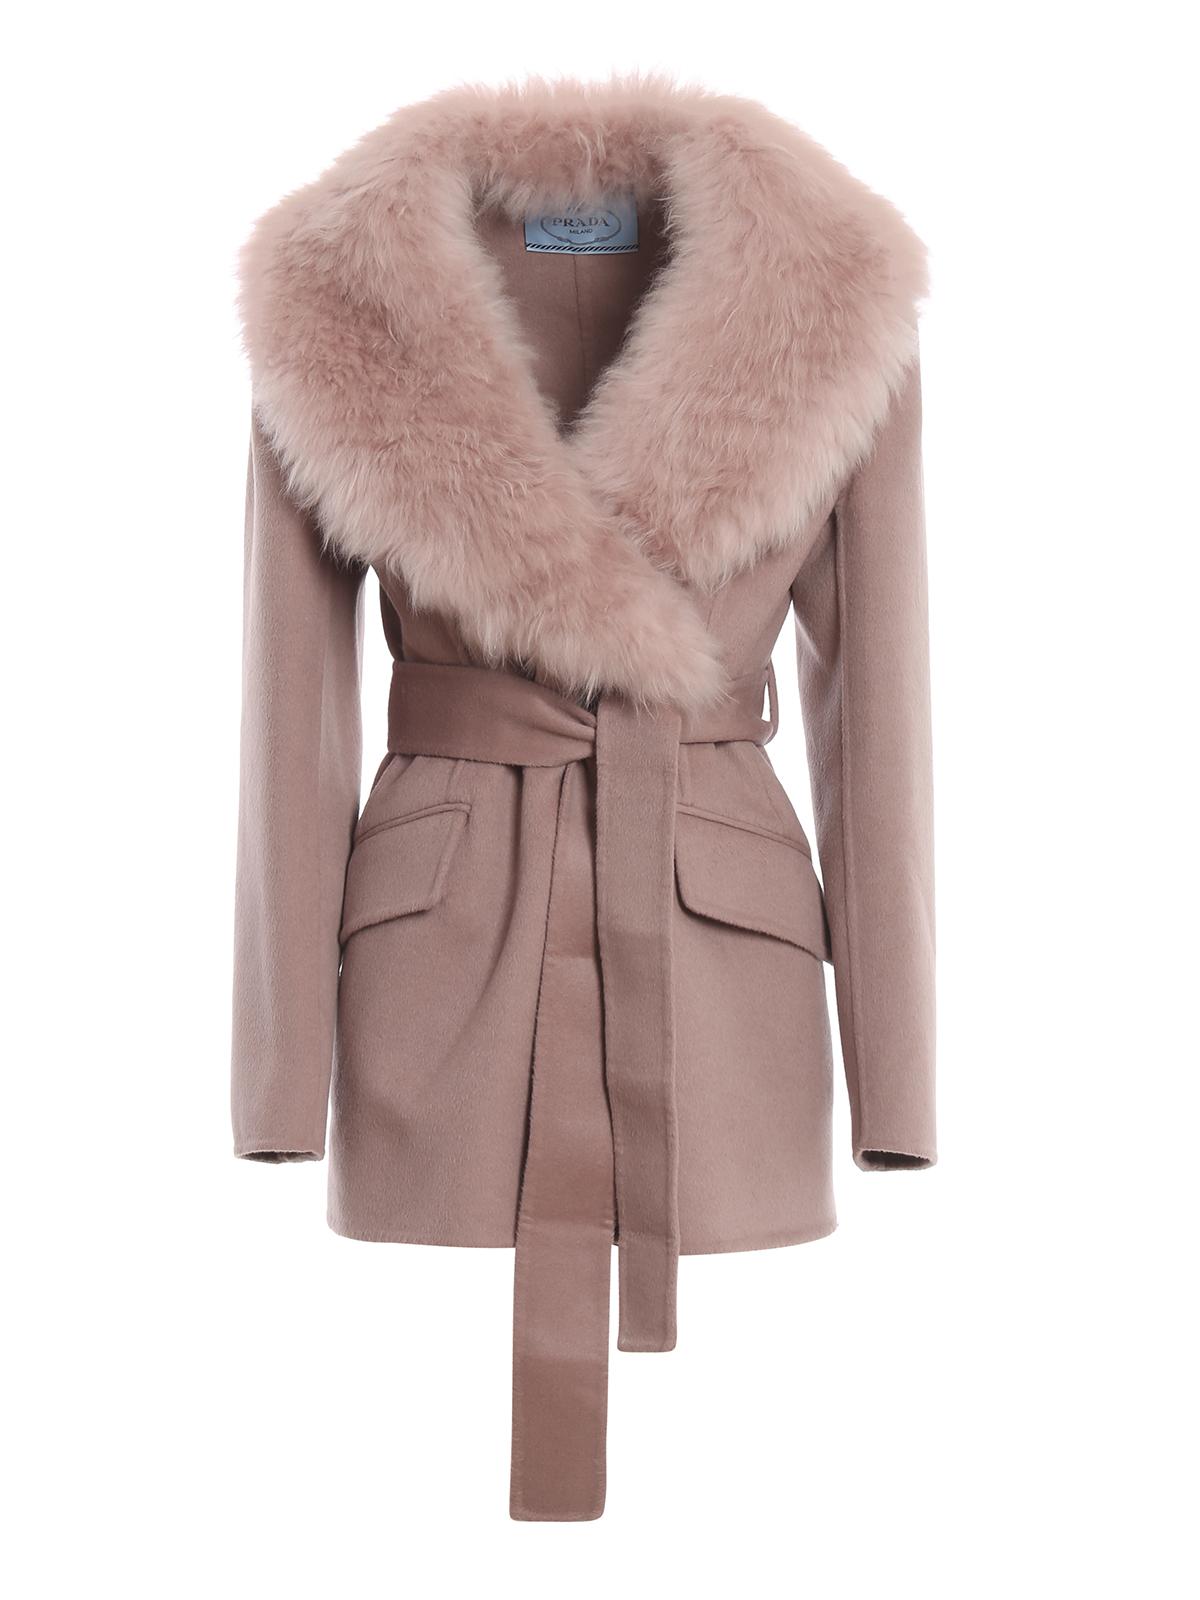 Prada Fur Trimmed Collar Wool And Angora Coat In Pink